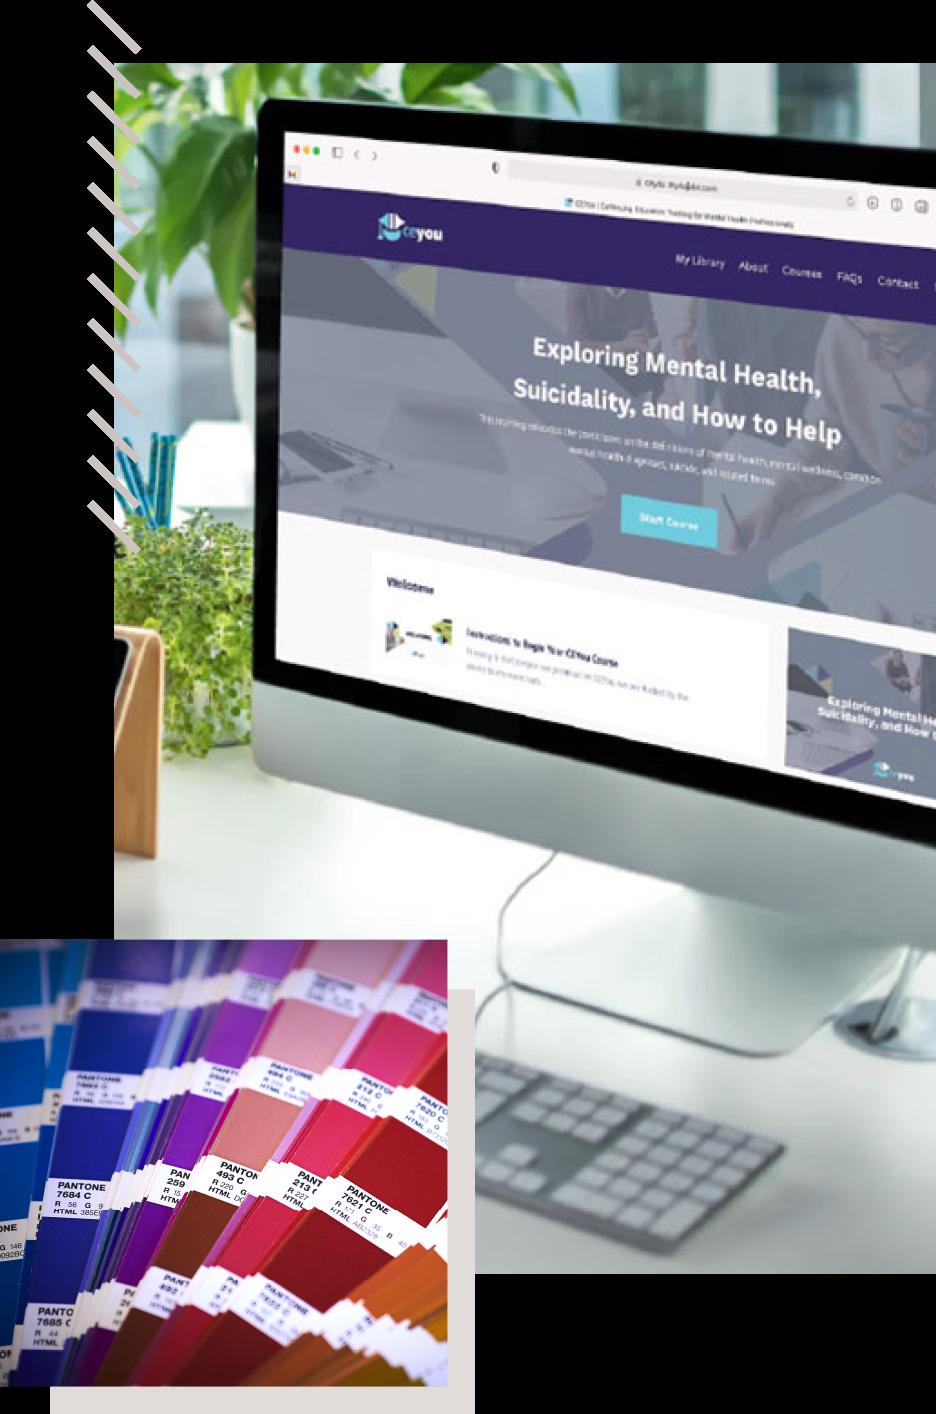 website design and brand colors for CE You continuing education platform